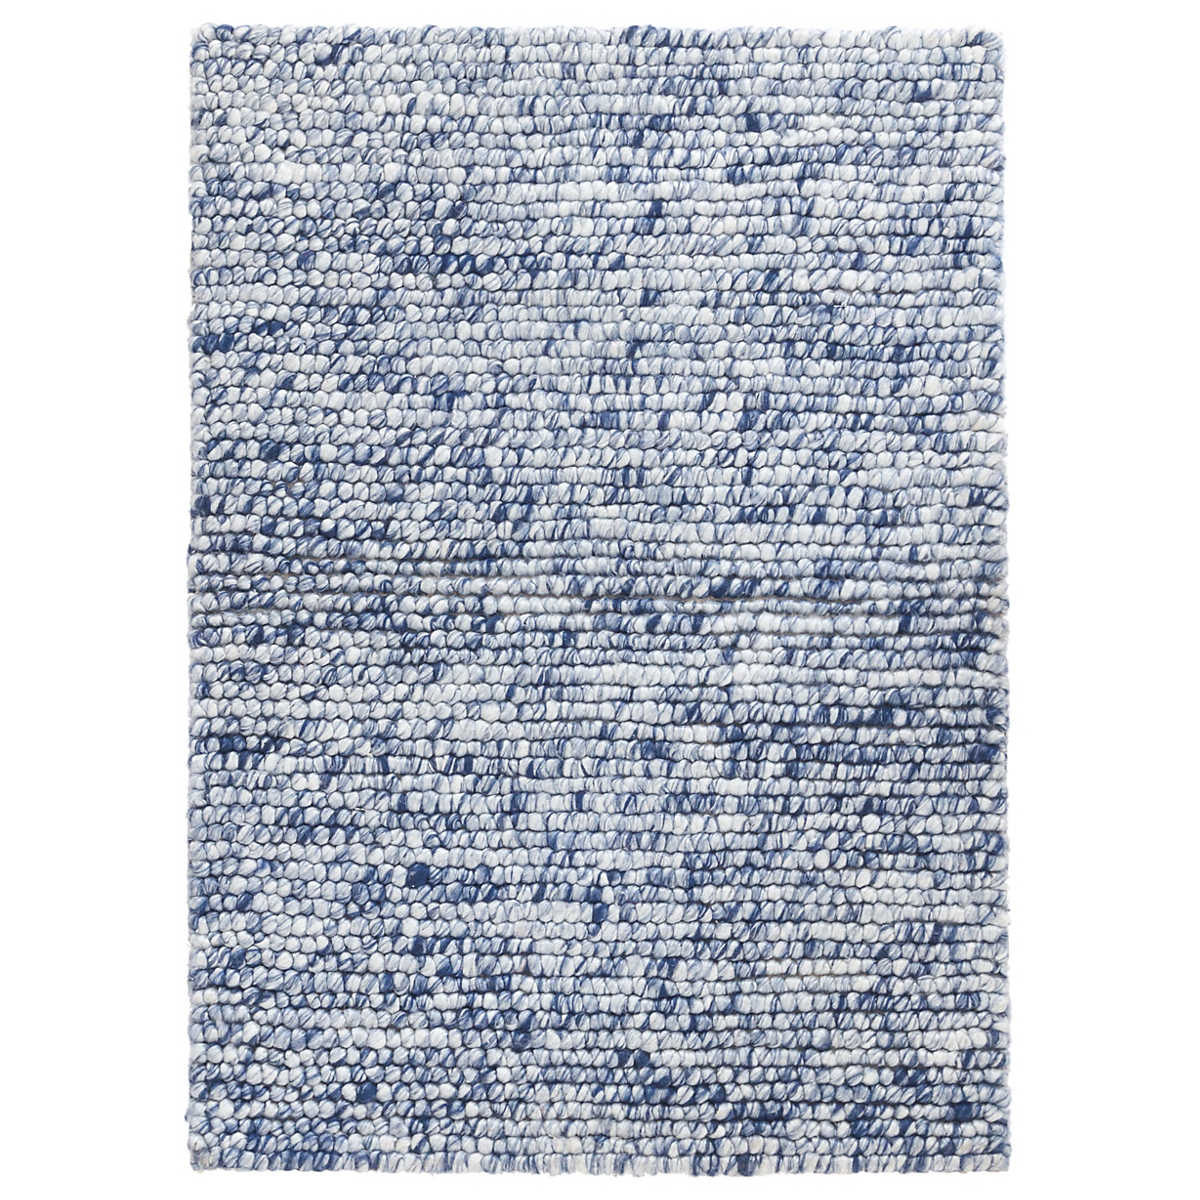 Niels Navy Woven Wool/Viscose Rug | Dash & Albert